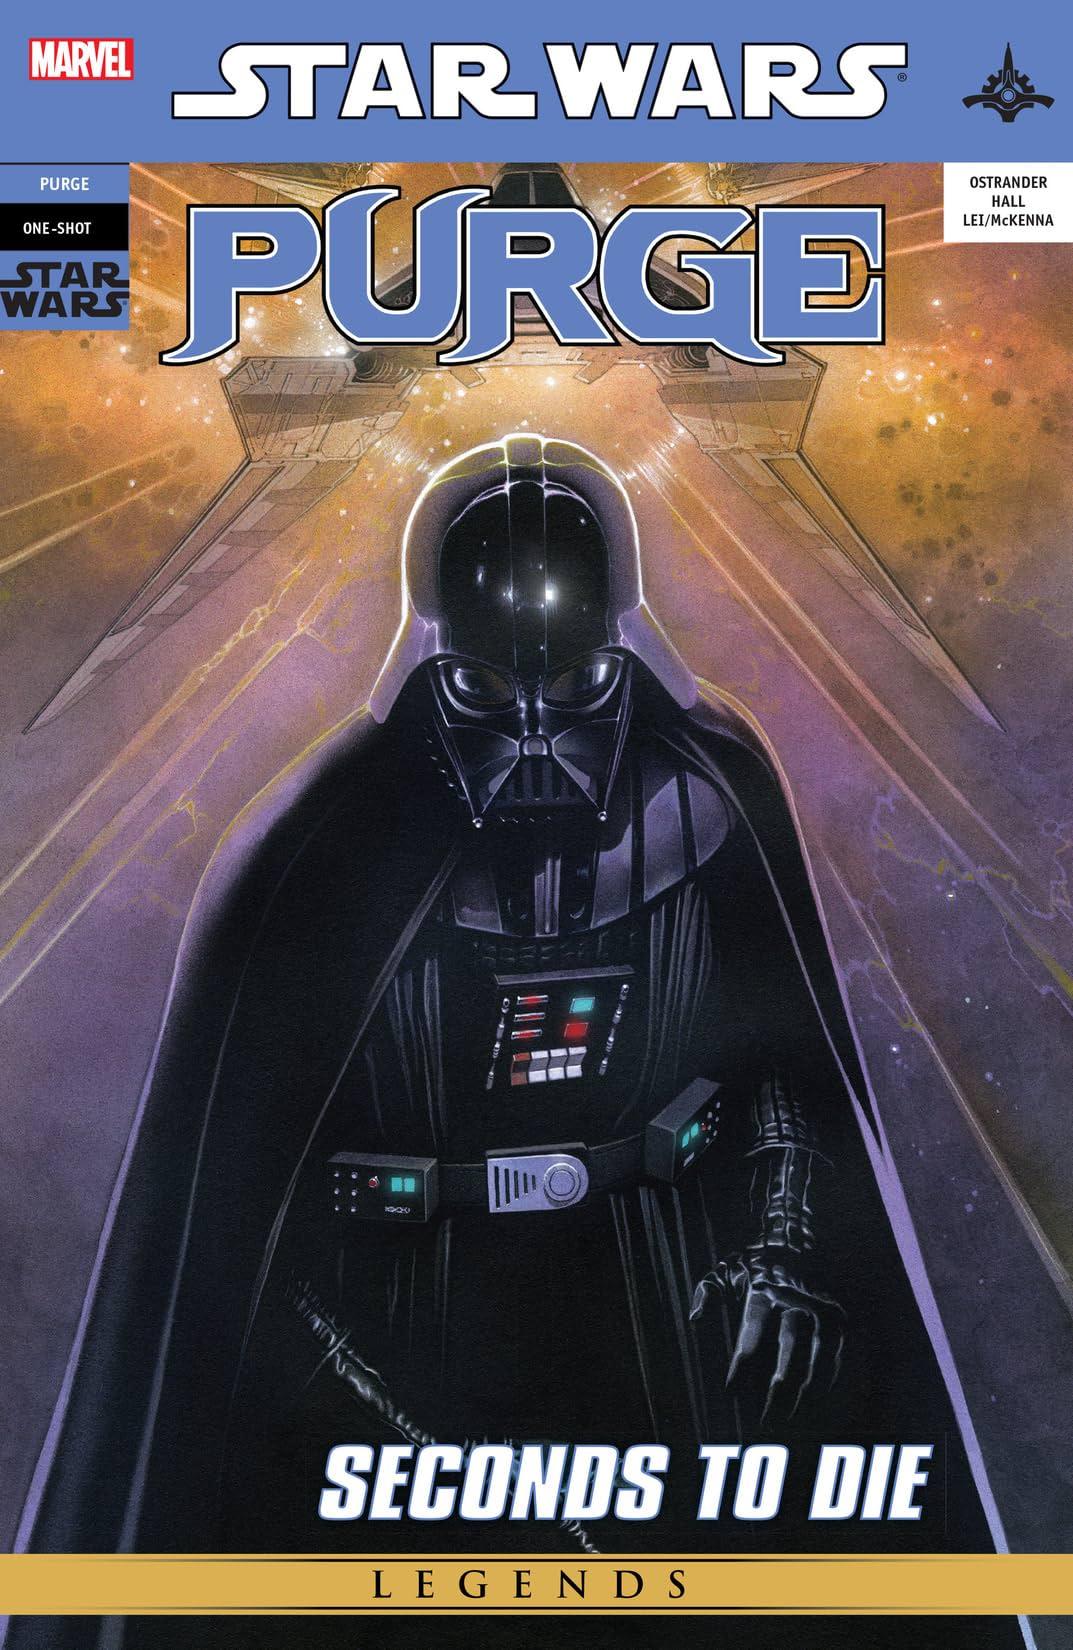 Star Wars: Purge - Seconds to Die (2009)